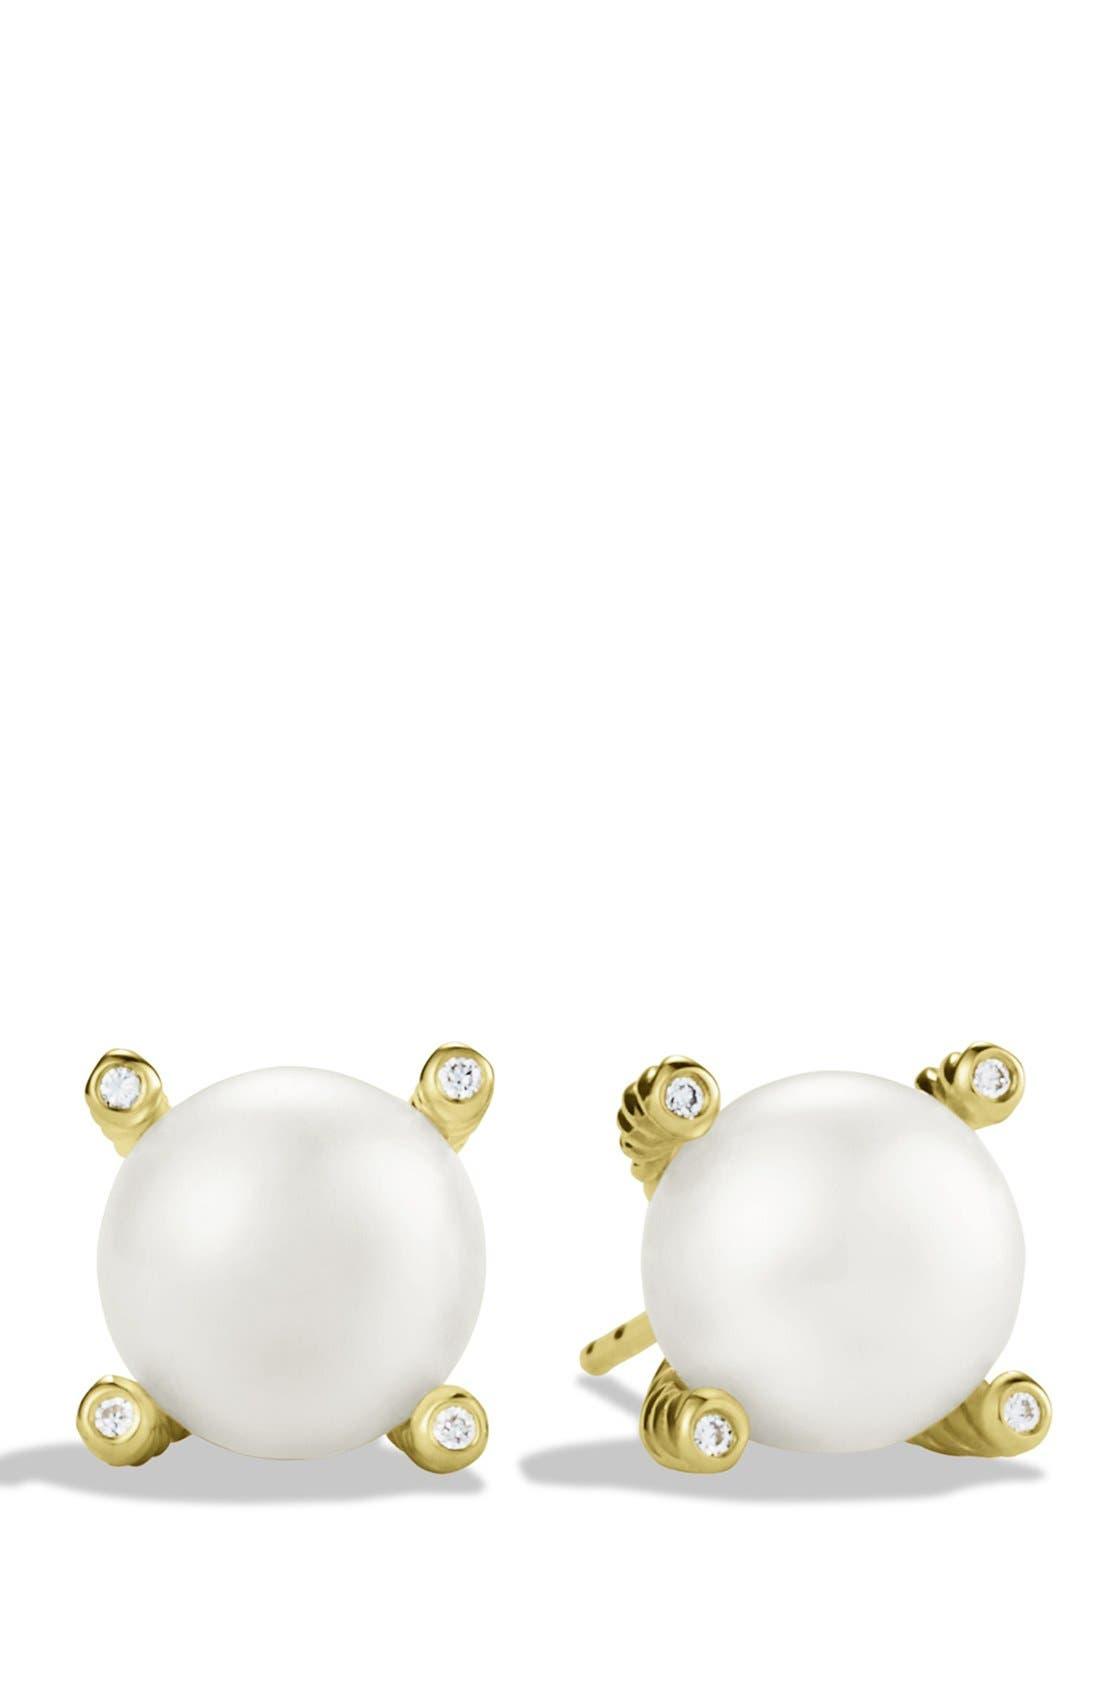 Alternate Image 1 Selected - David Yurman Pearl Earrings with Diamonds in Gold